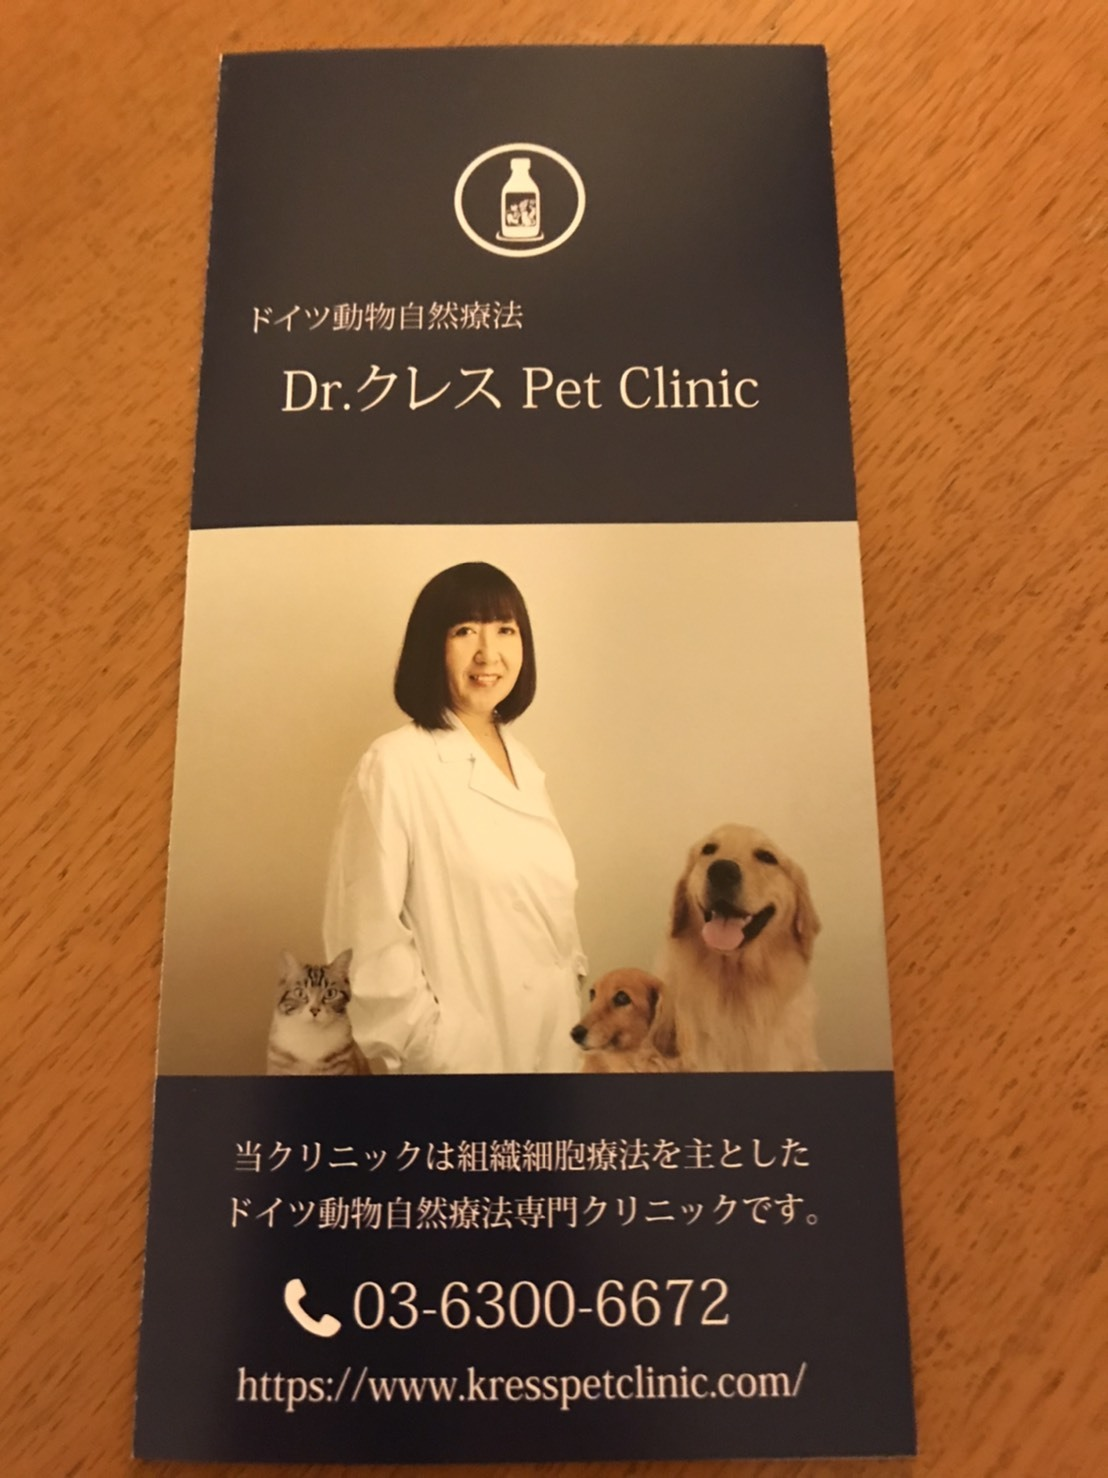 Dr.クレス Pet Clinic 開院♪_d0339889_17060060.jpg